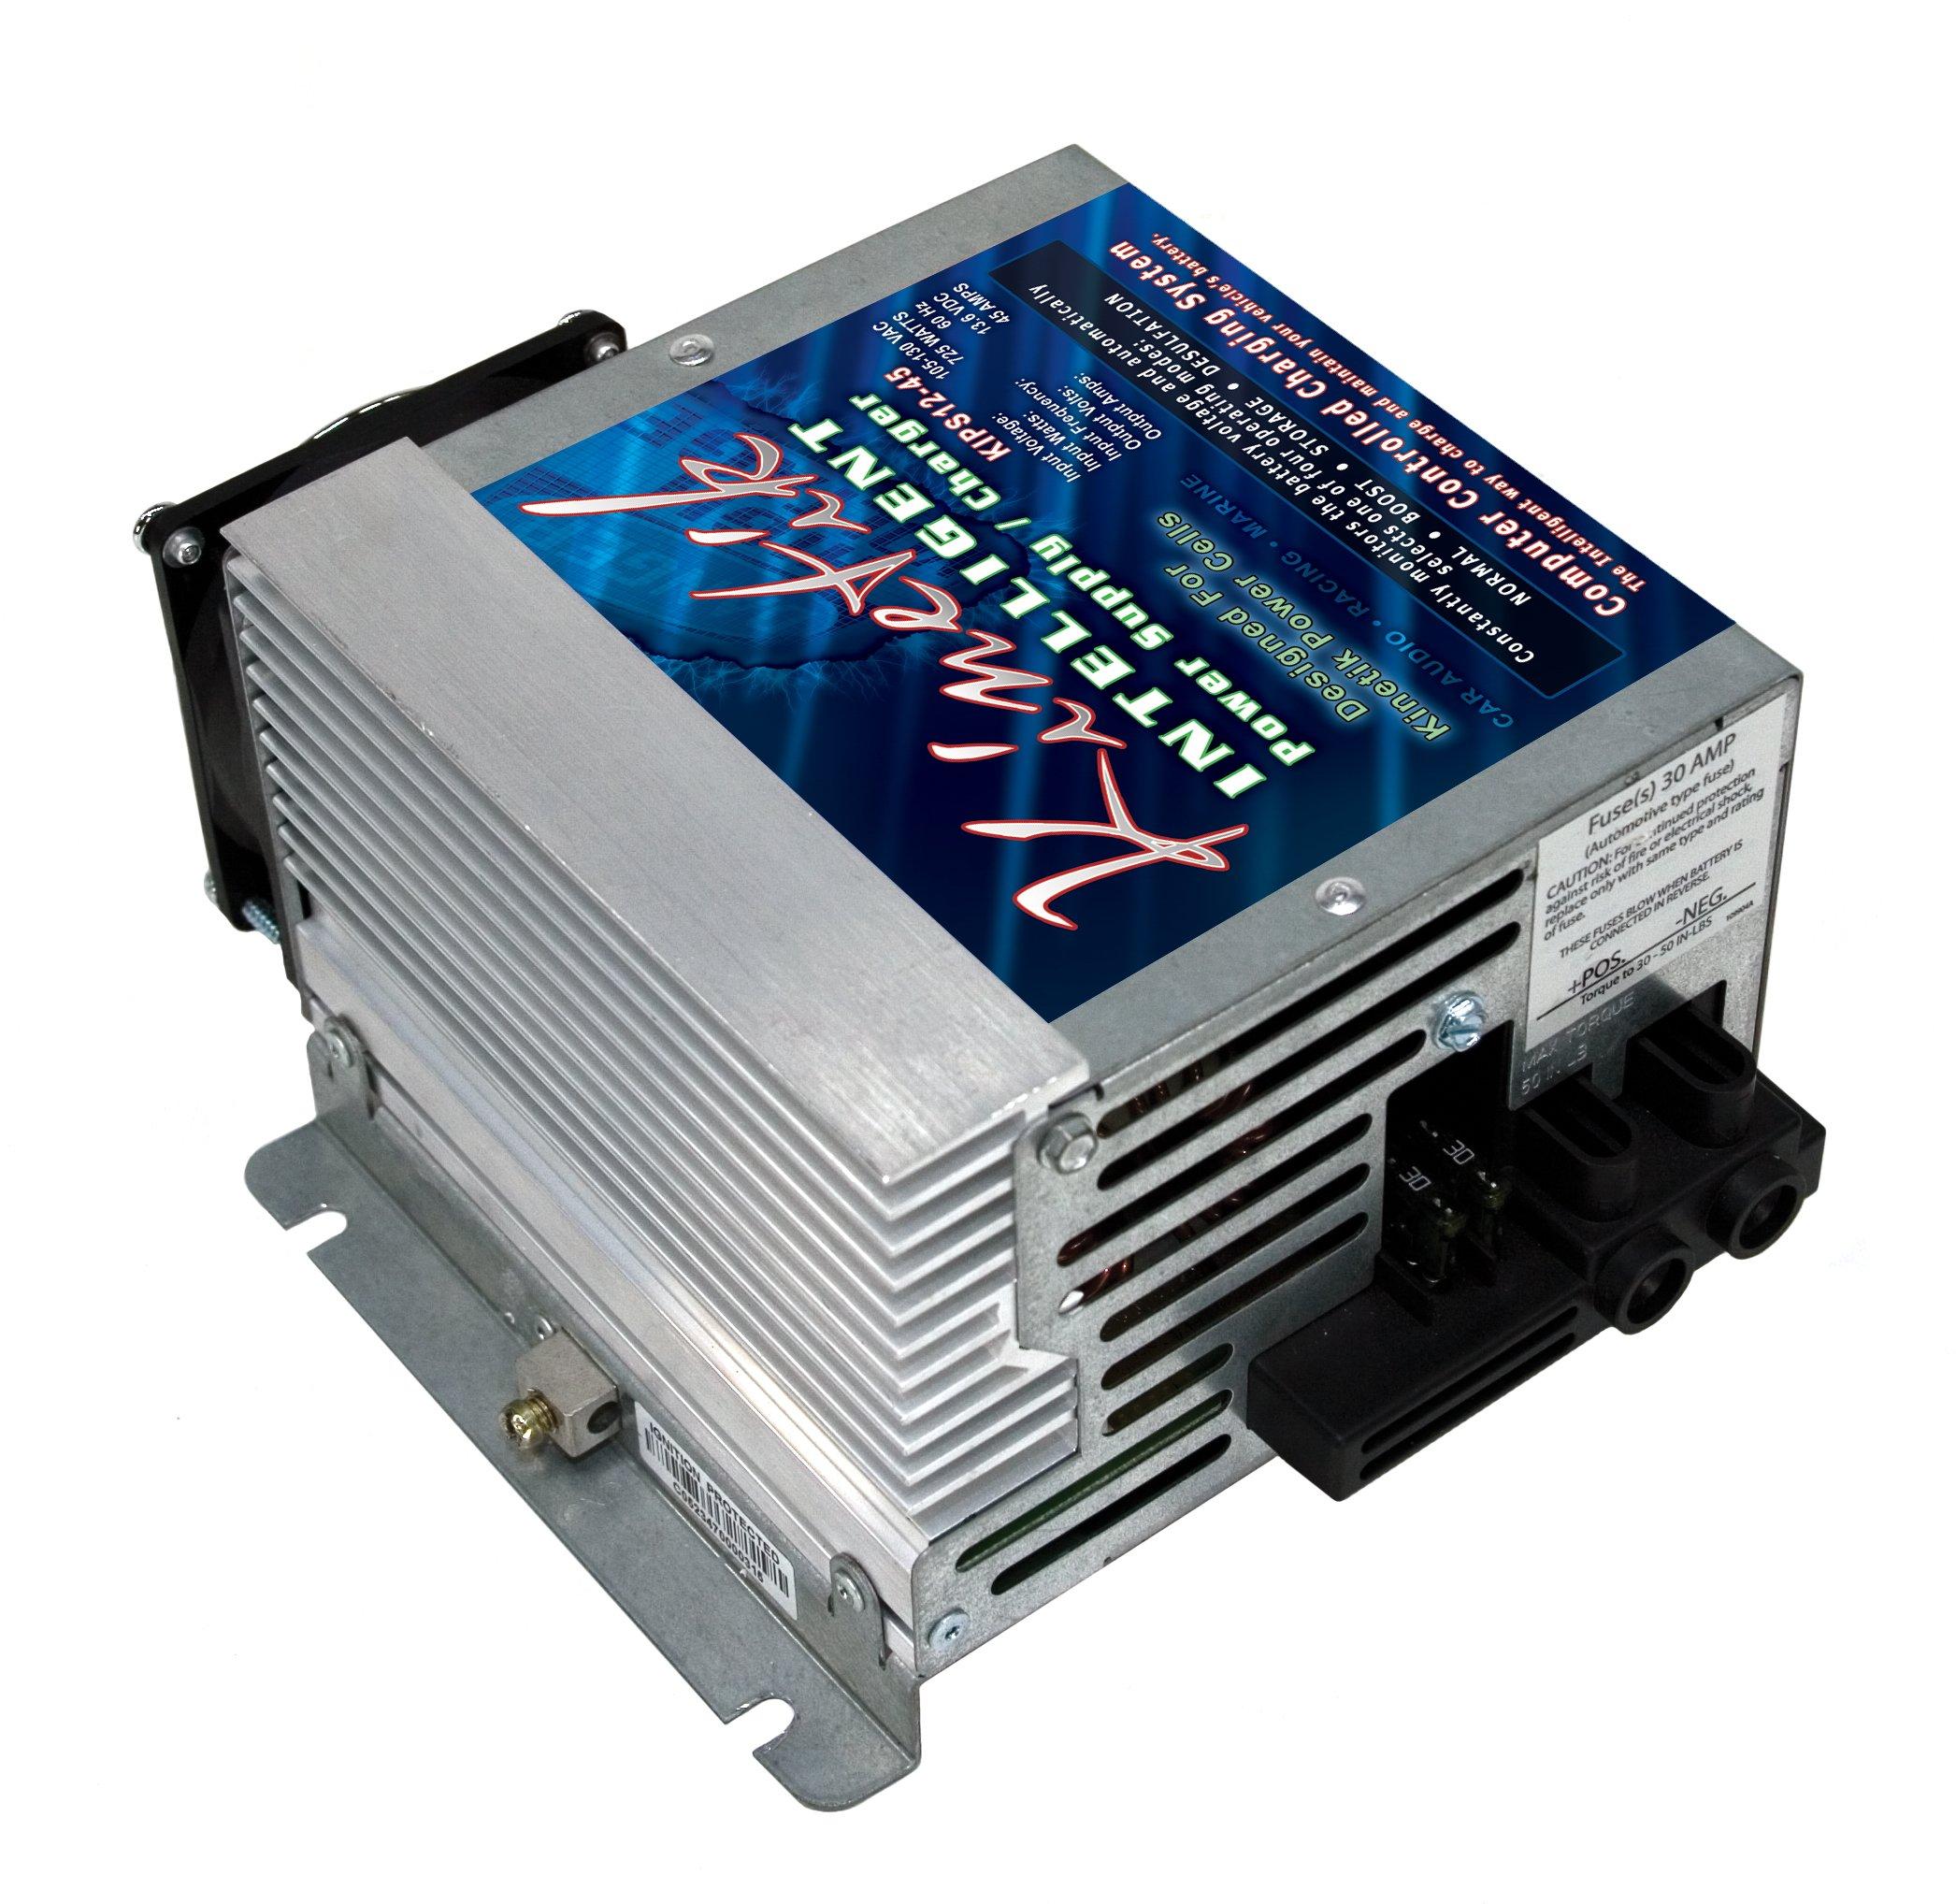 Kinetik KIPS12-45 45A 12V Intelligent Power Supply